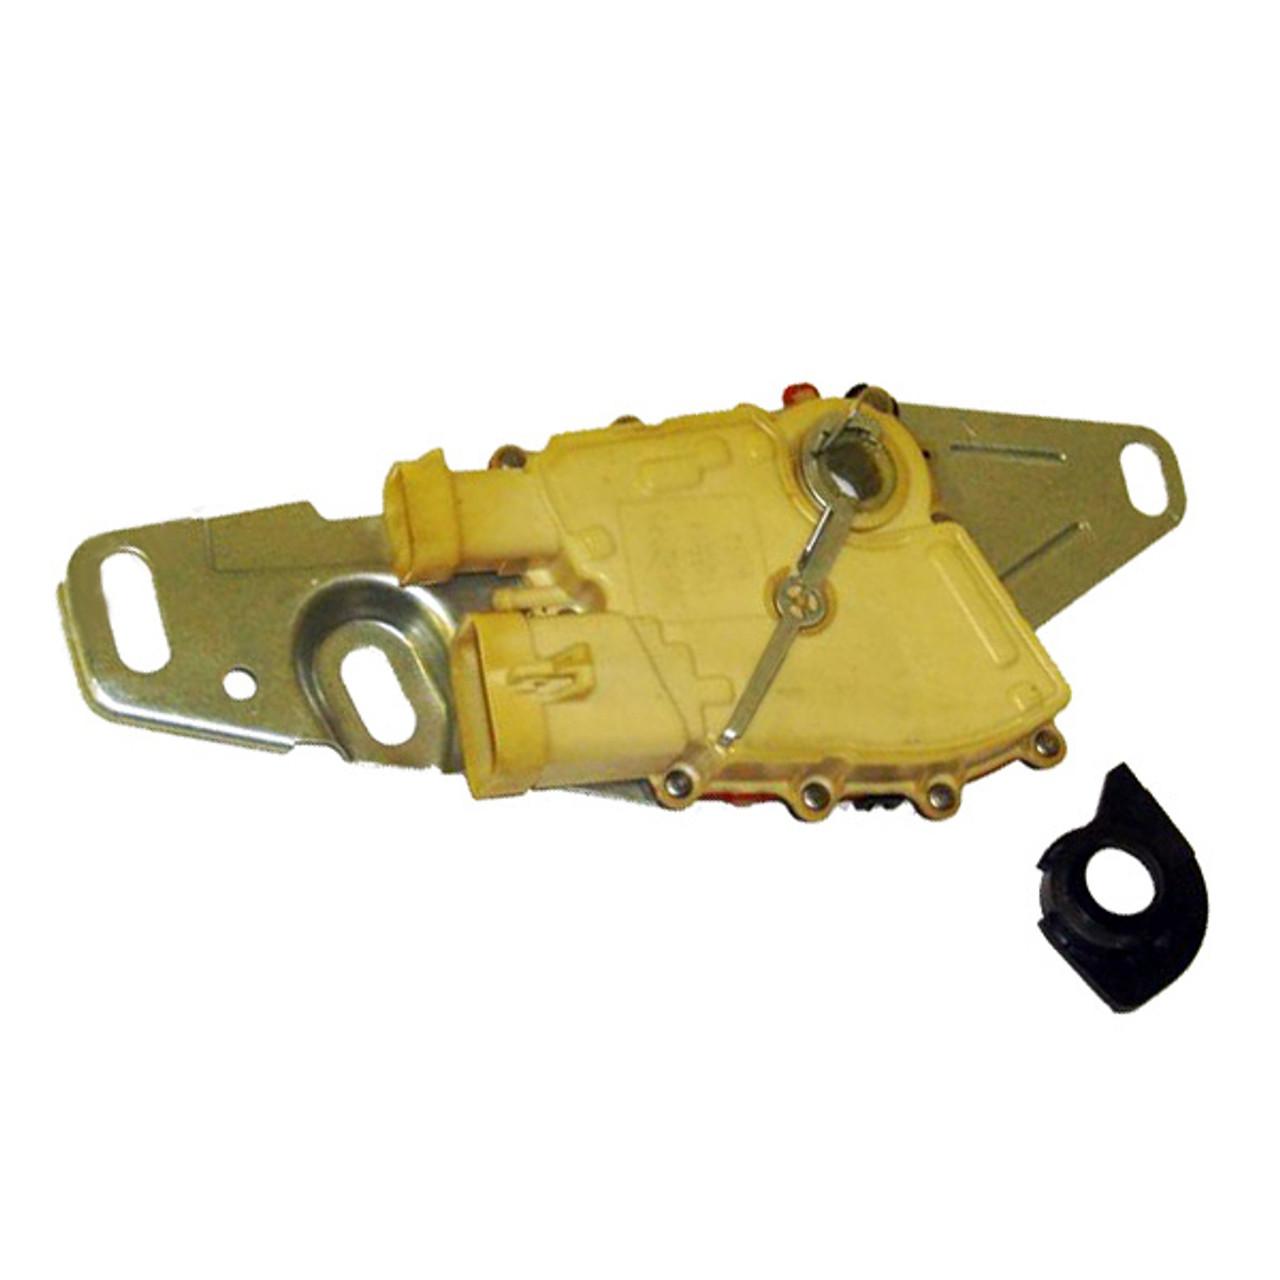 74-78 Firebird Trans Am NSBU Park Reverse Neutral Safety Switch on Column